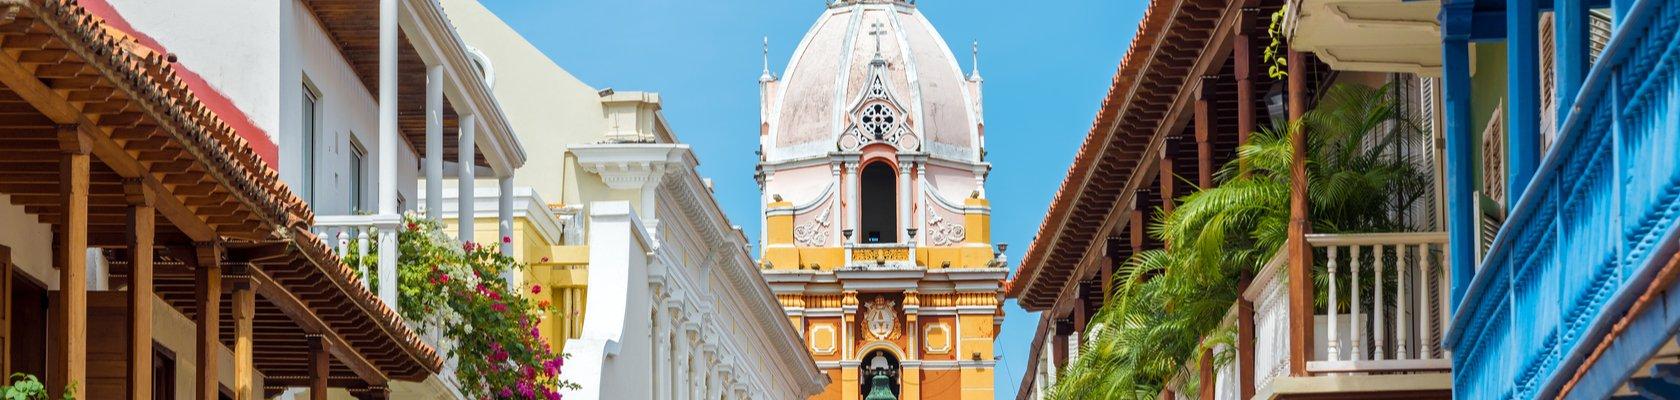 Colombia's 'kroonjuweel' Cartagena